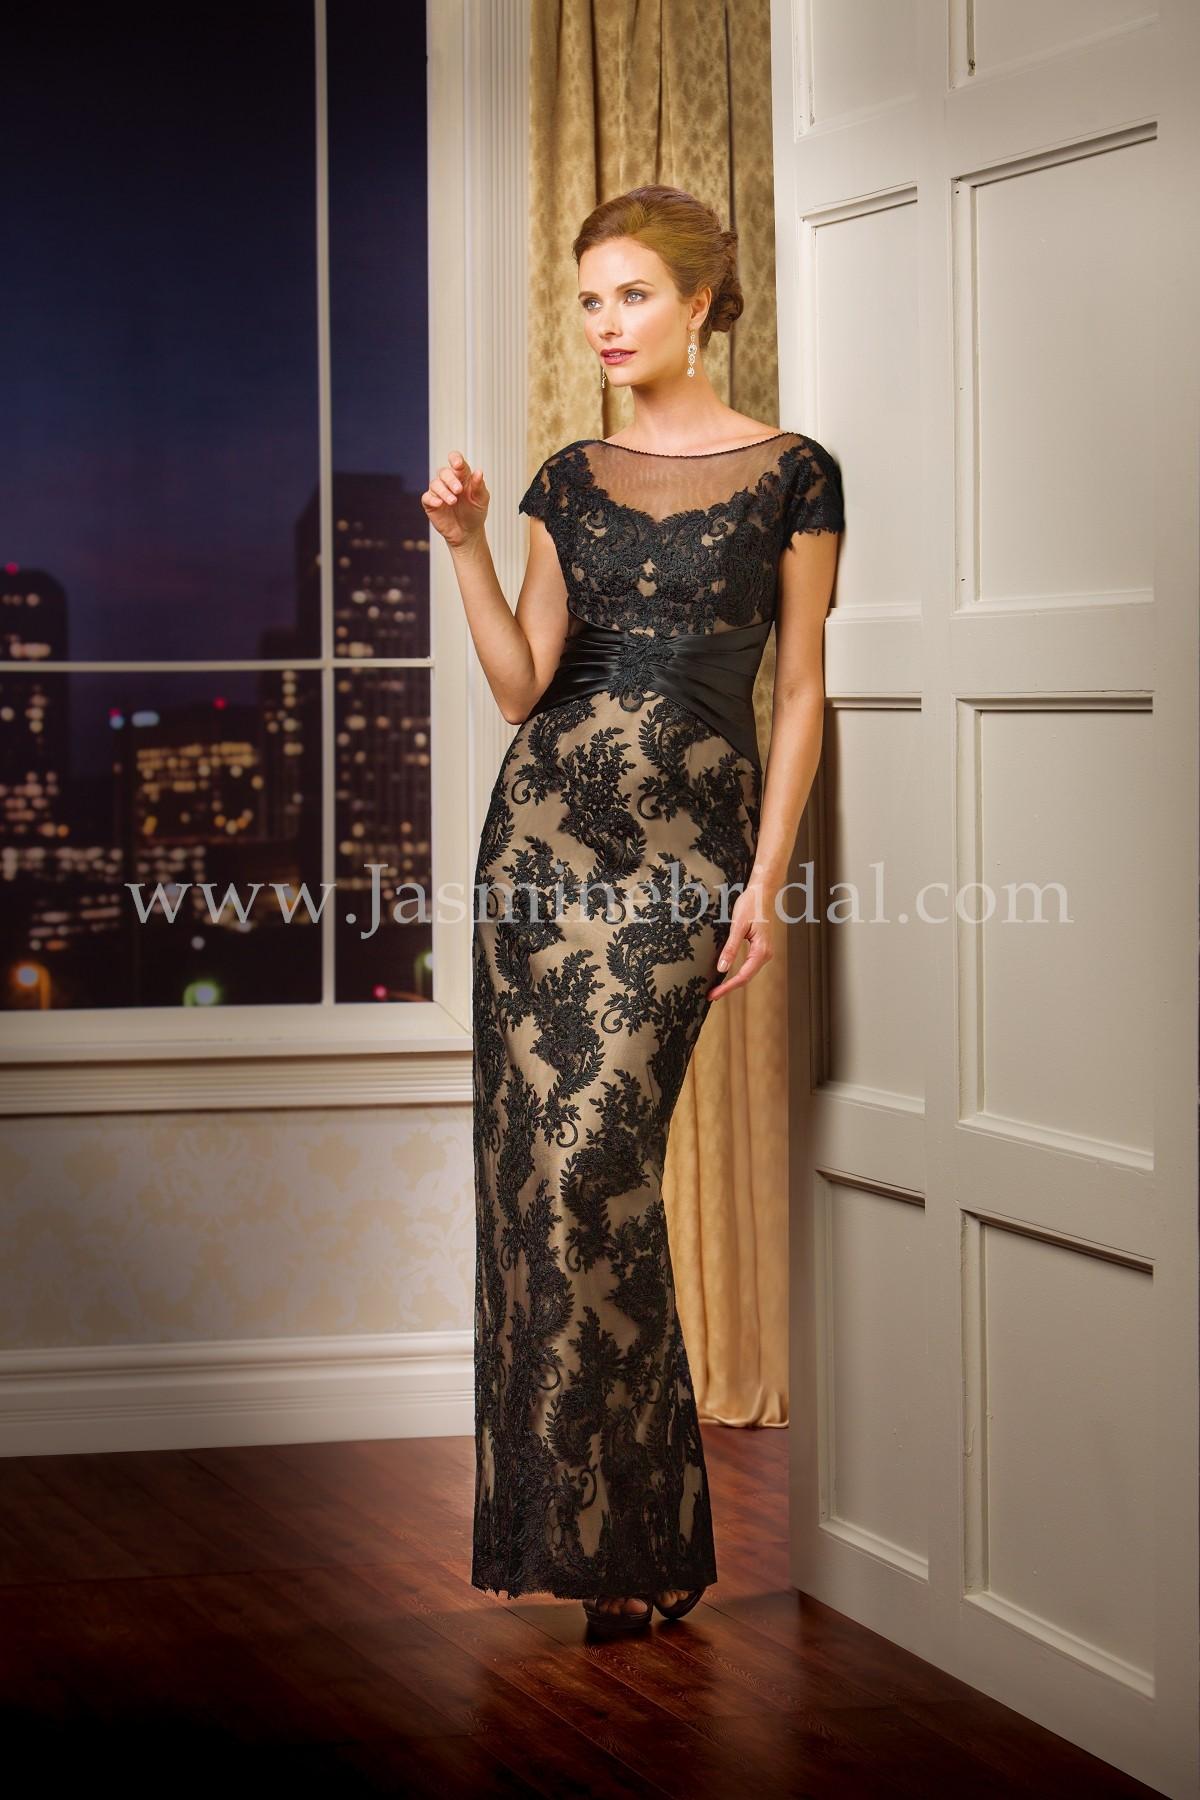 K178069 Long Boat Neckline Malay Satin Amp Lace Mob Dress